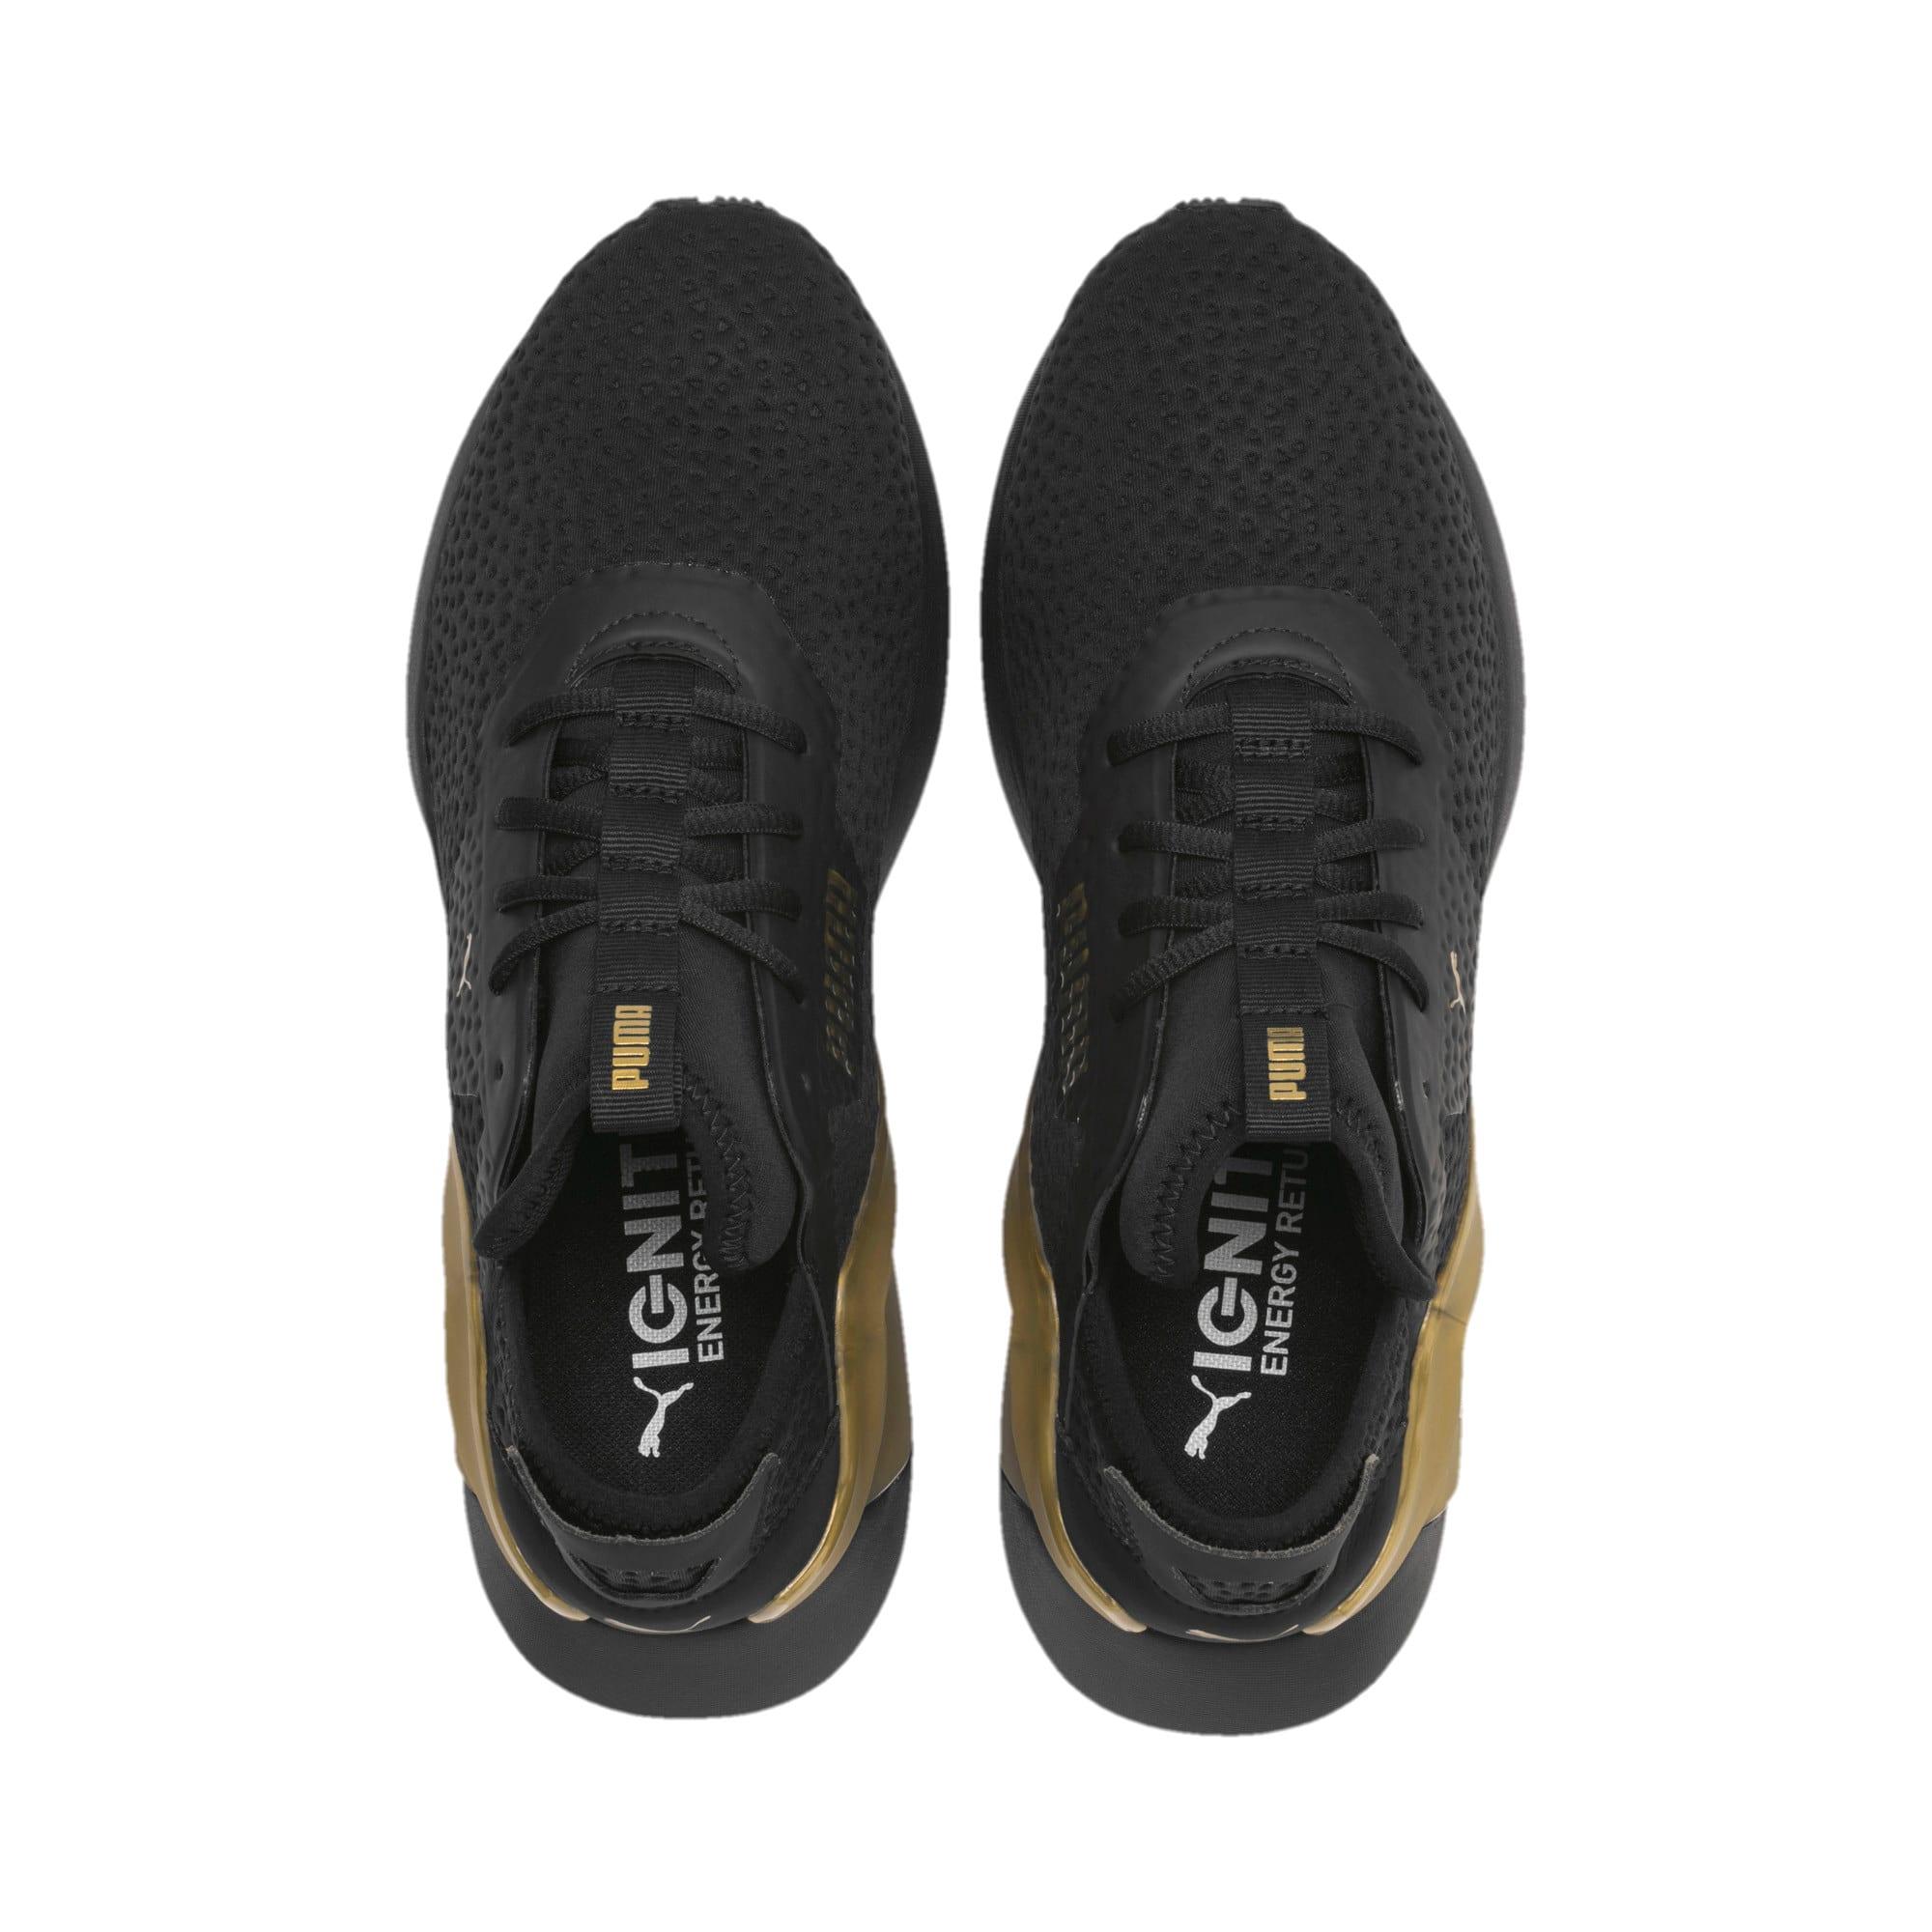 Thumbnail 7 of Rogue X Metallic Herren Sneaker, Puma Black-Gold, medium